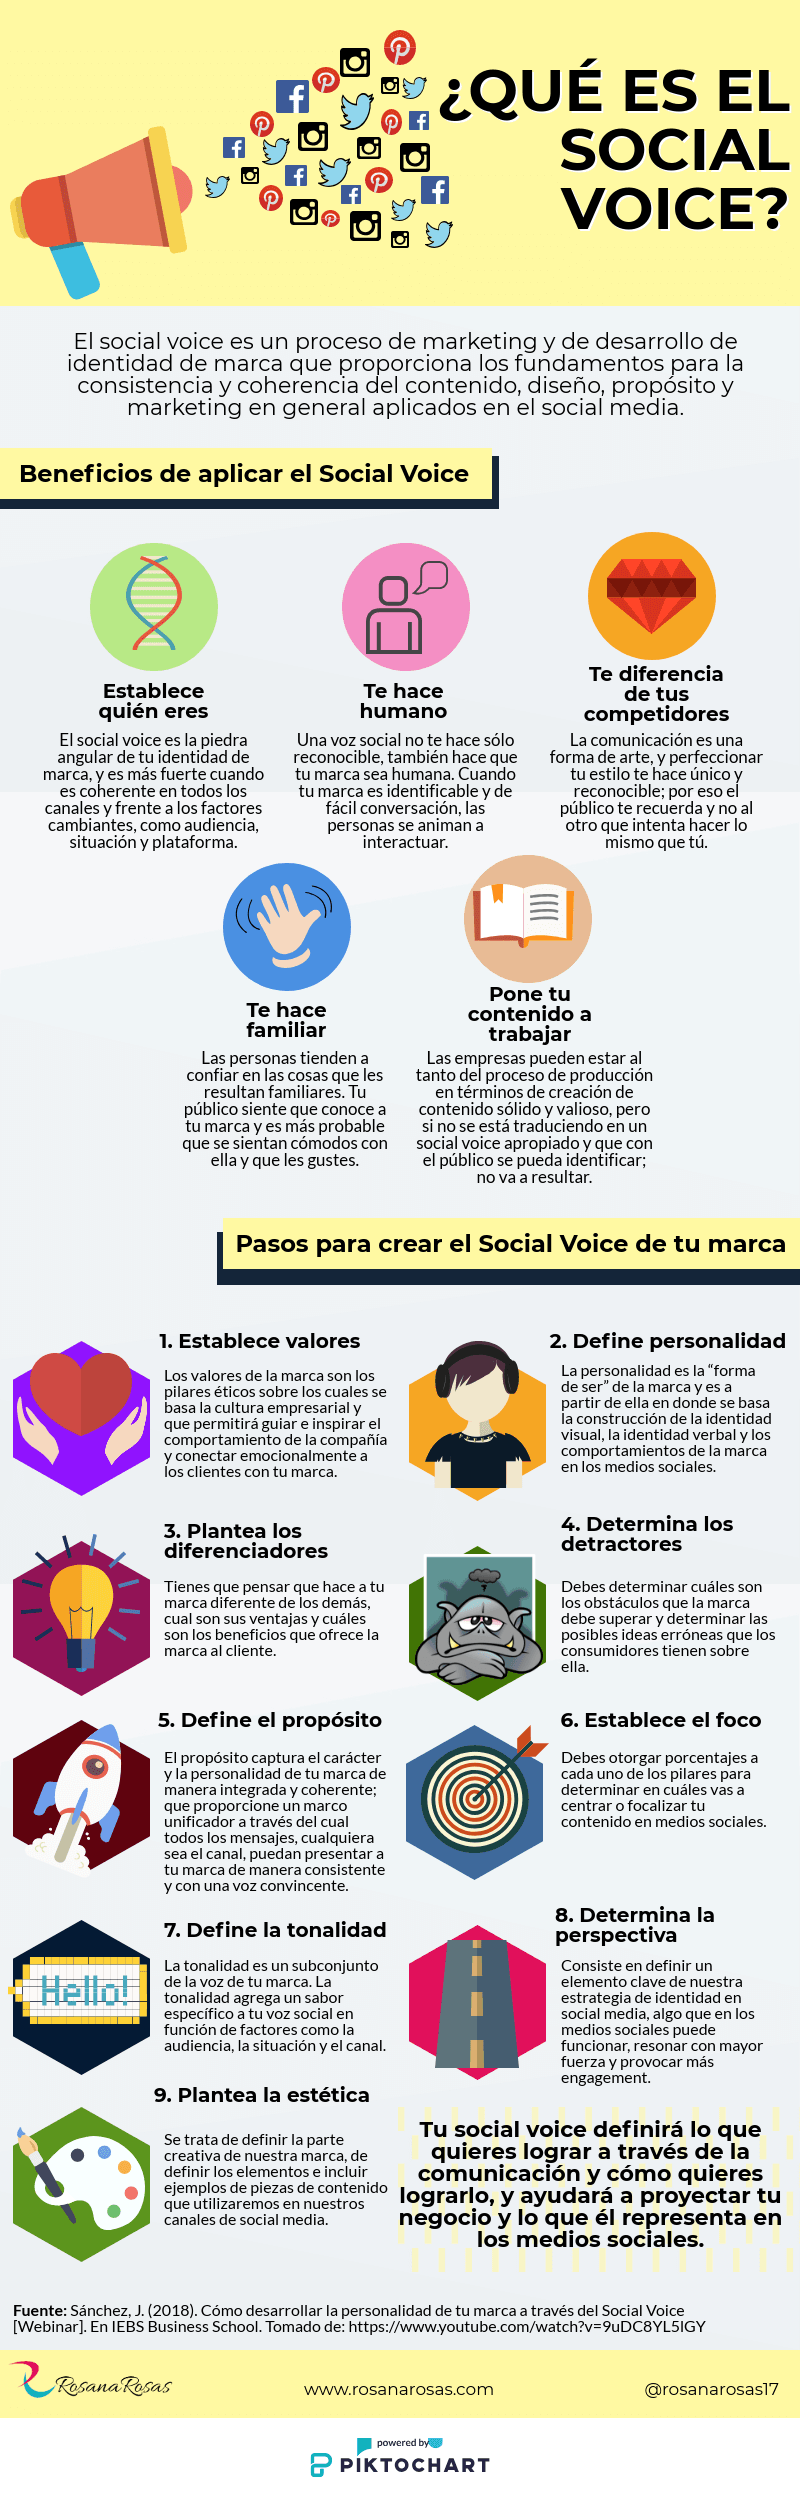 Qué es Social Voice #infografia #socialmedia #marketing